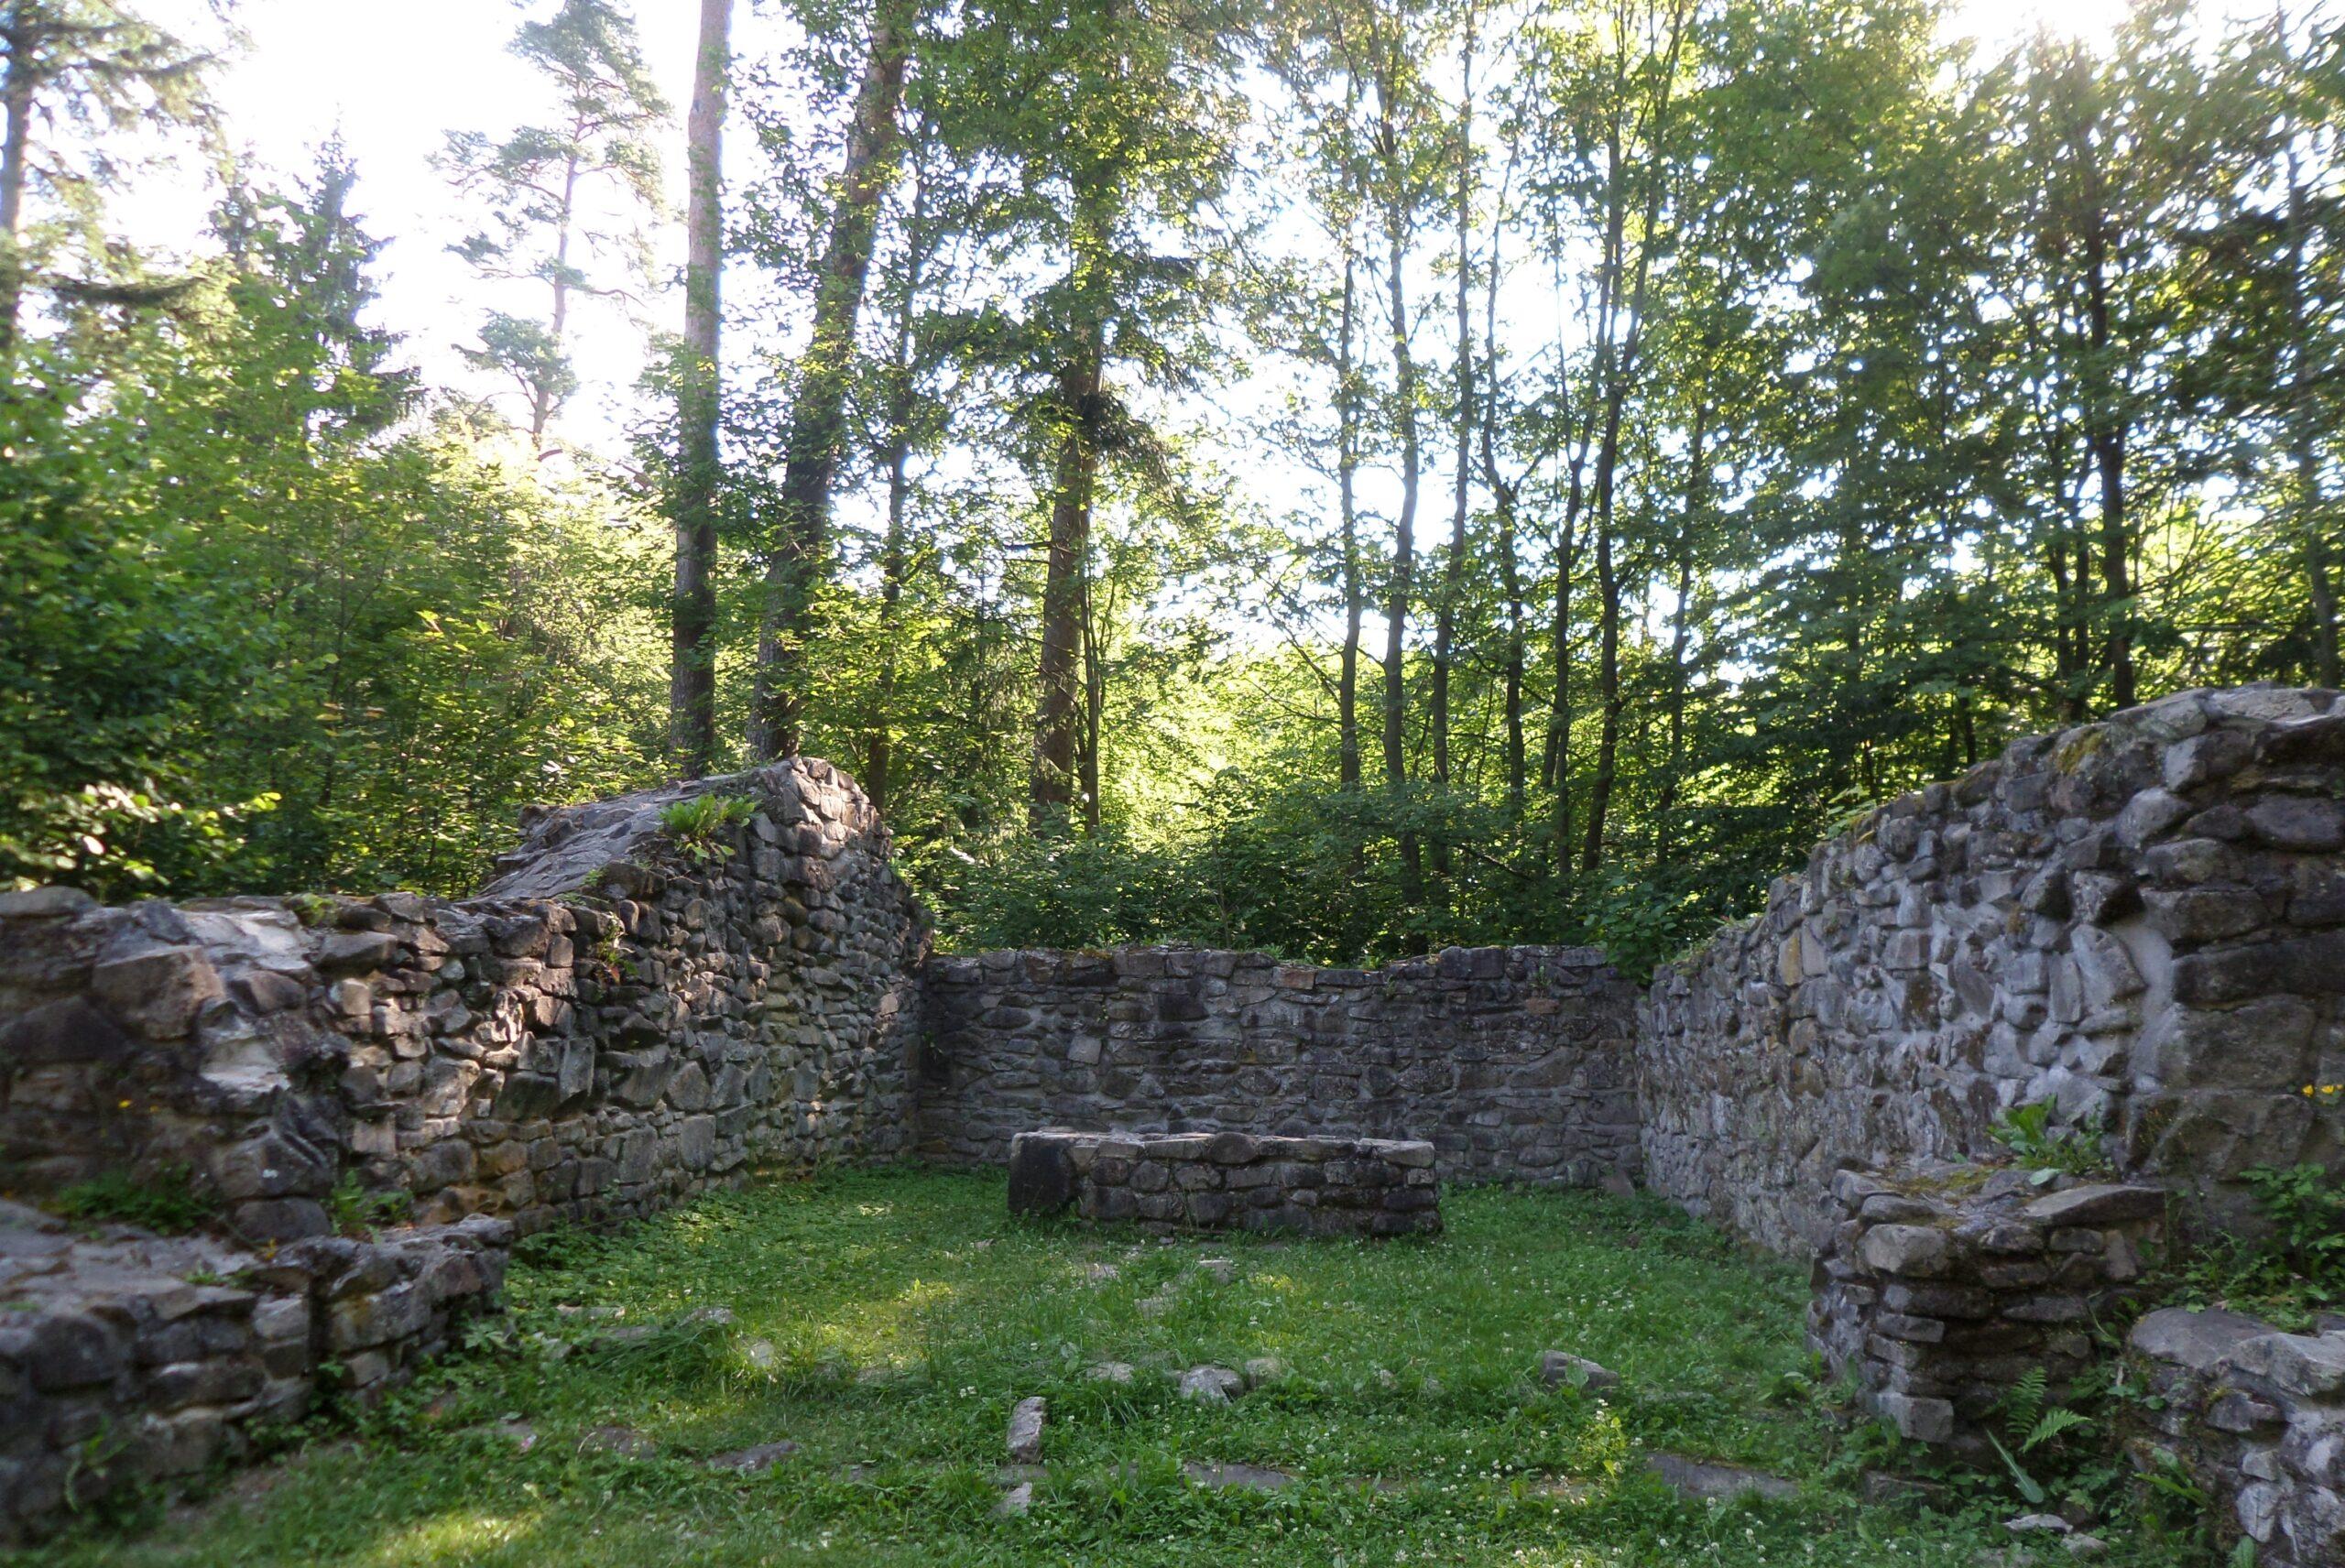 Zřícenina kostela sv. Linharta u obory sv. Linhart